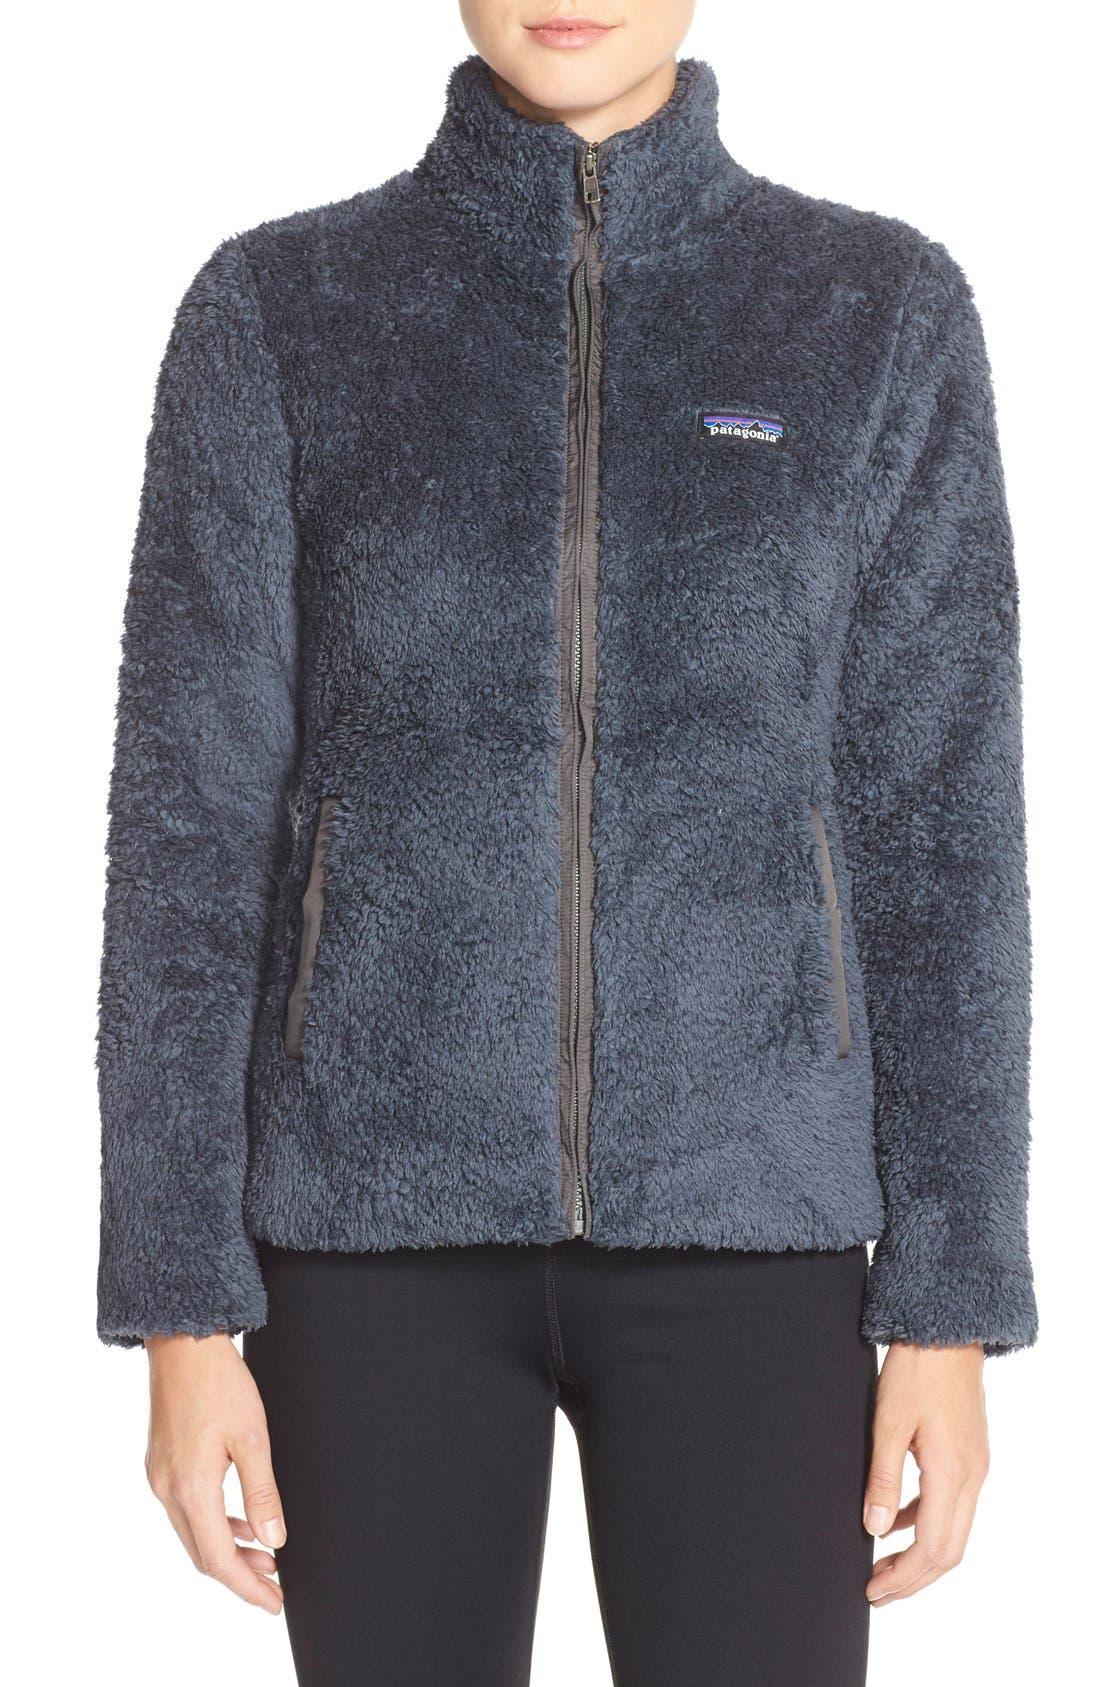 Main Image - Patagonia 'Los Gatos' Water Resistant Fleece Jacket